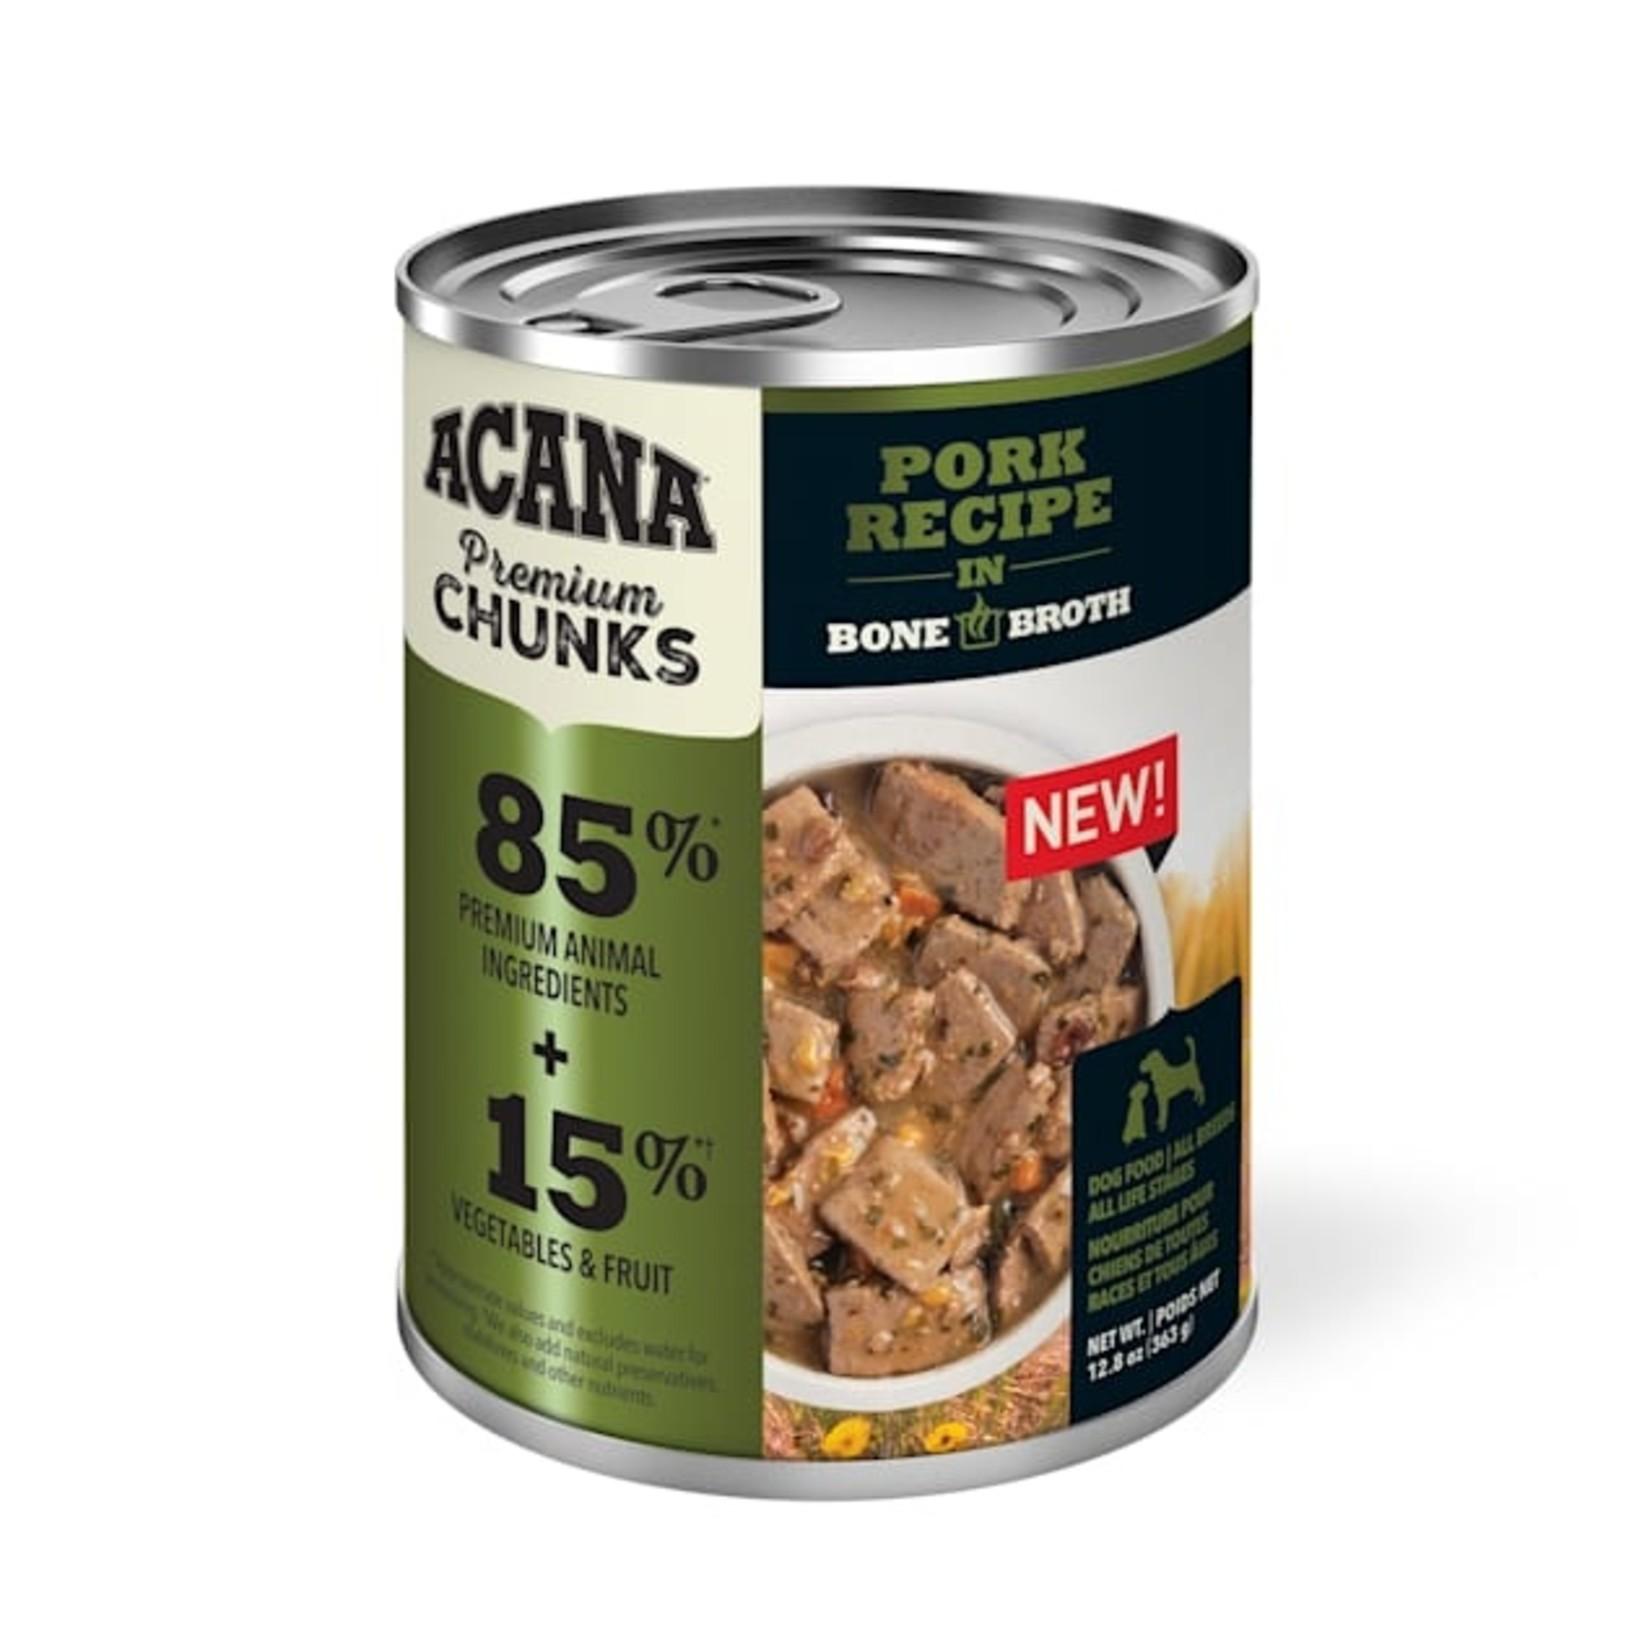 Acana Acana Pork Recipe Dog Can 12.8 oz